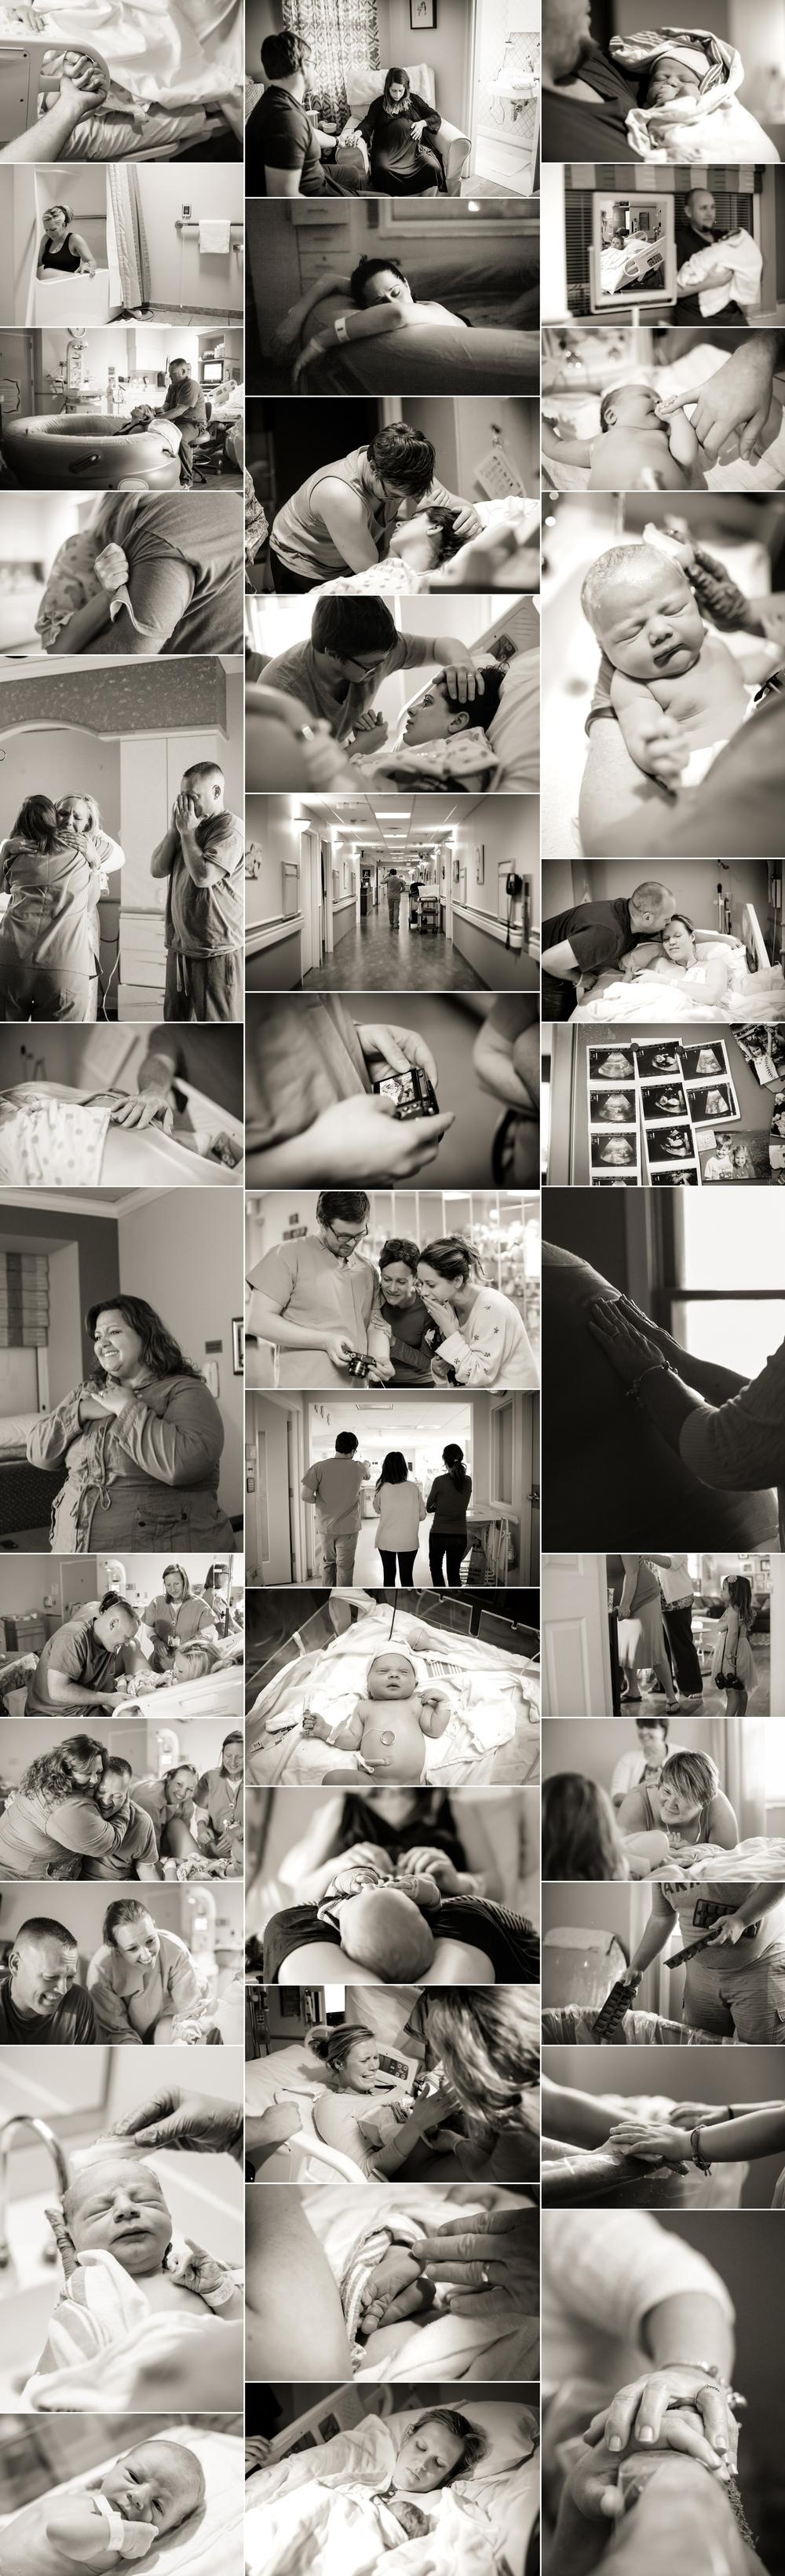 2014-Year-Review-Births_0001.jpg